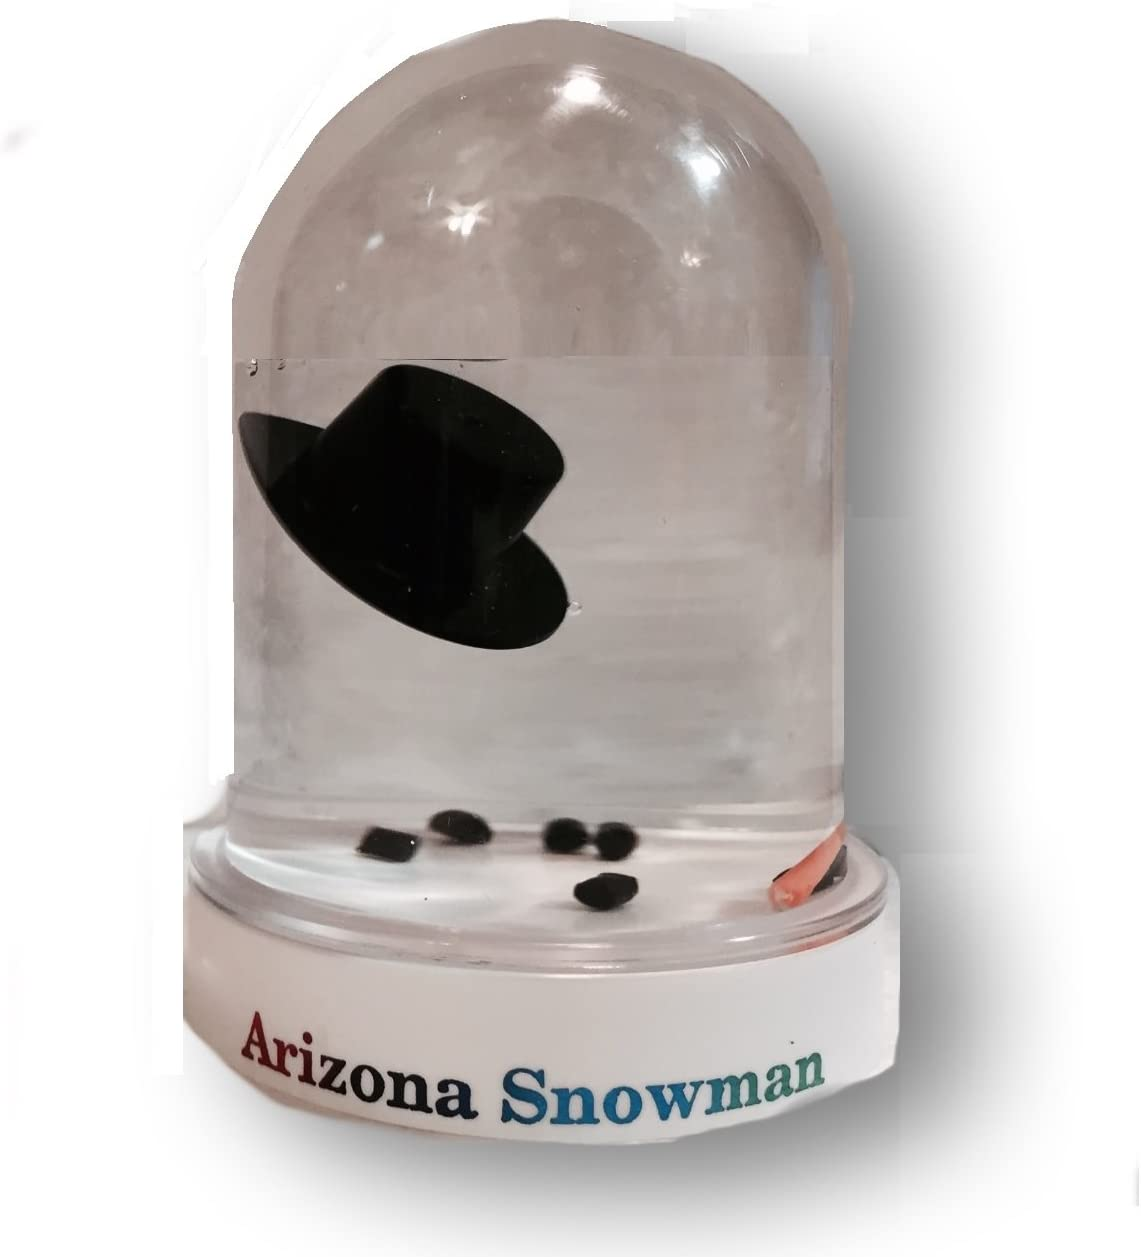 Snowglobe Original Melted Snowman Snow Globe Travel Souvenir Gift (Arizona)